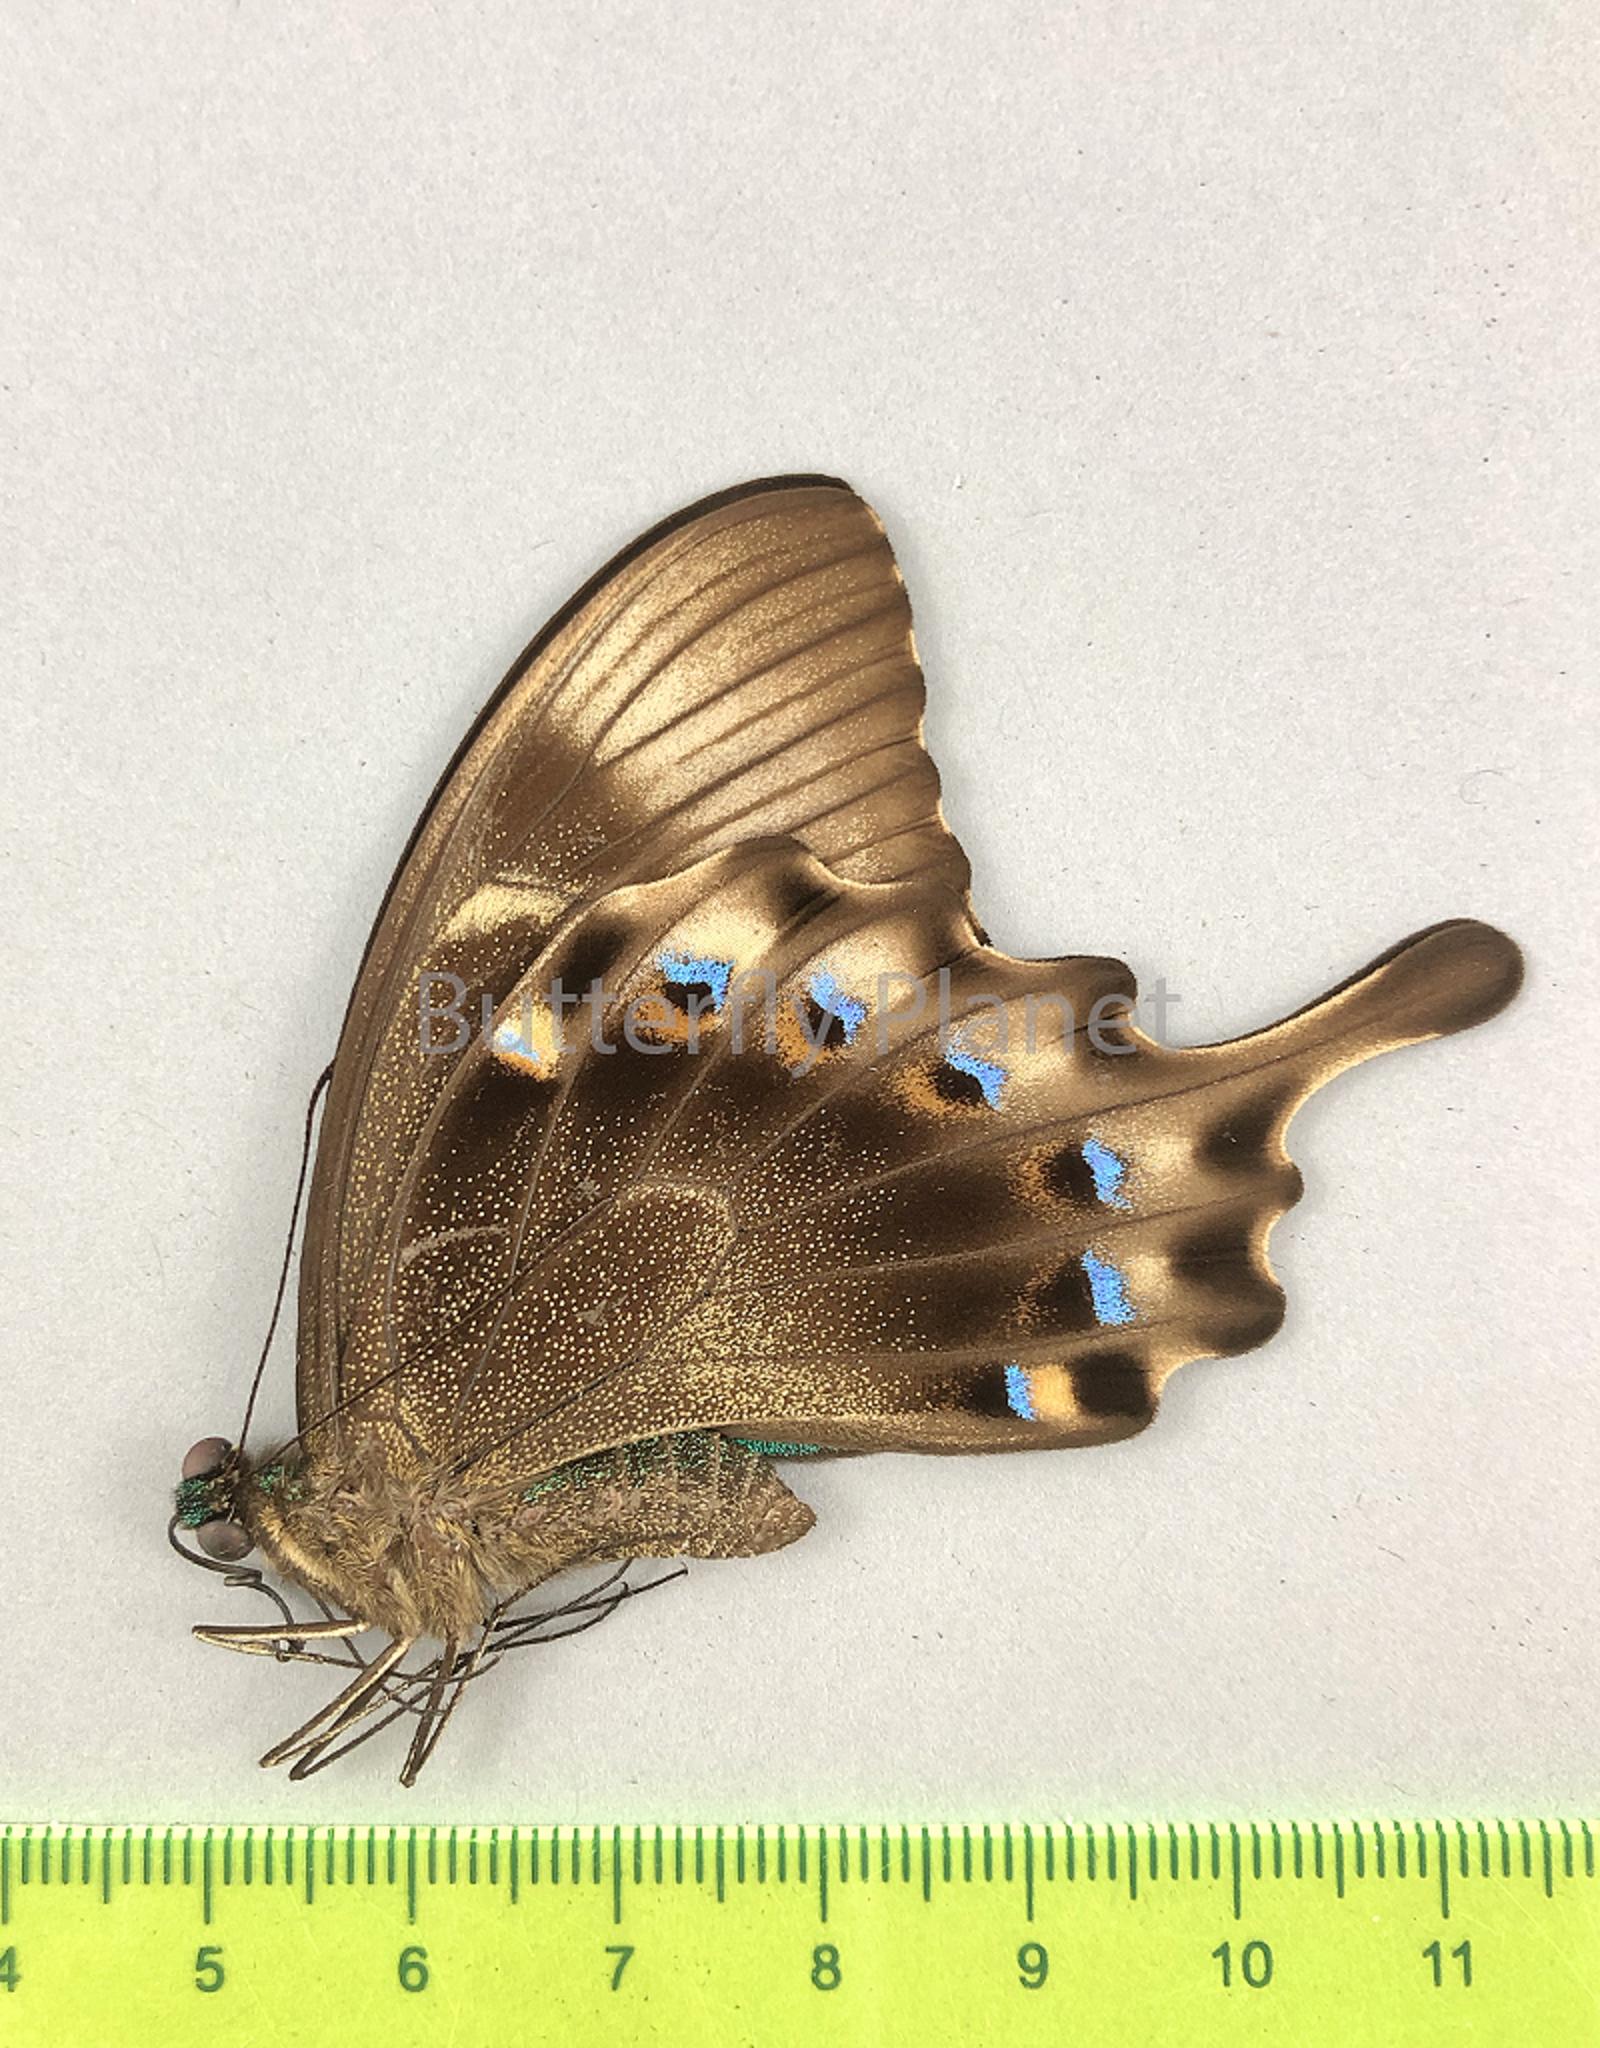 Papilio lorquinianus gelia M A1 Bachan, Isl., Indonesia